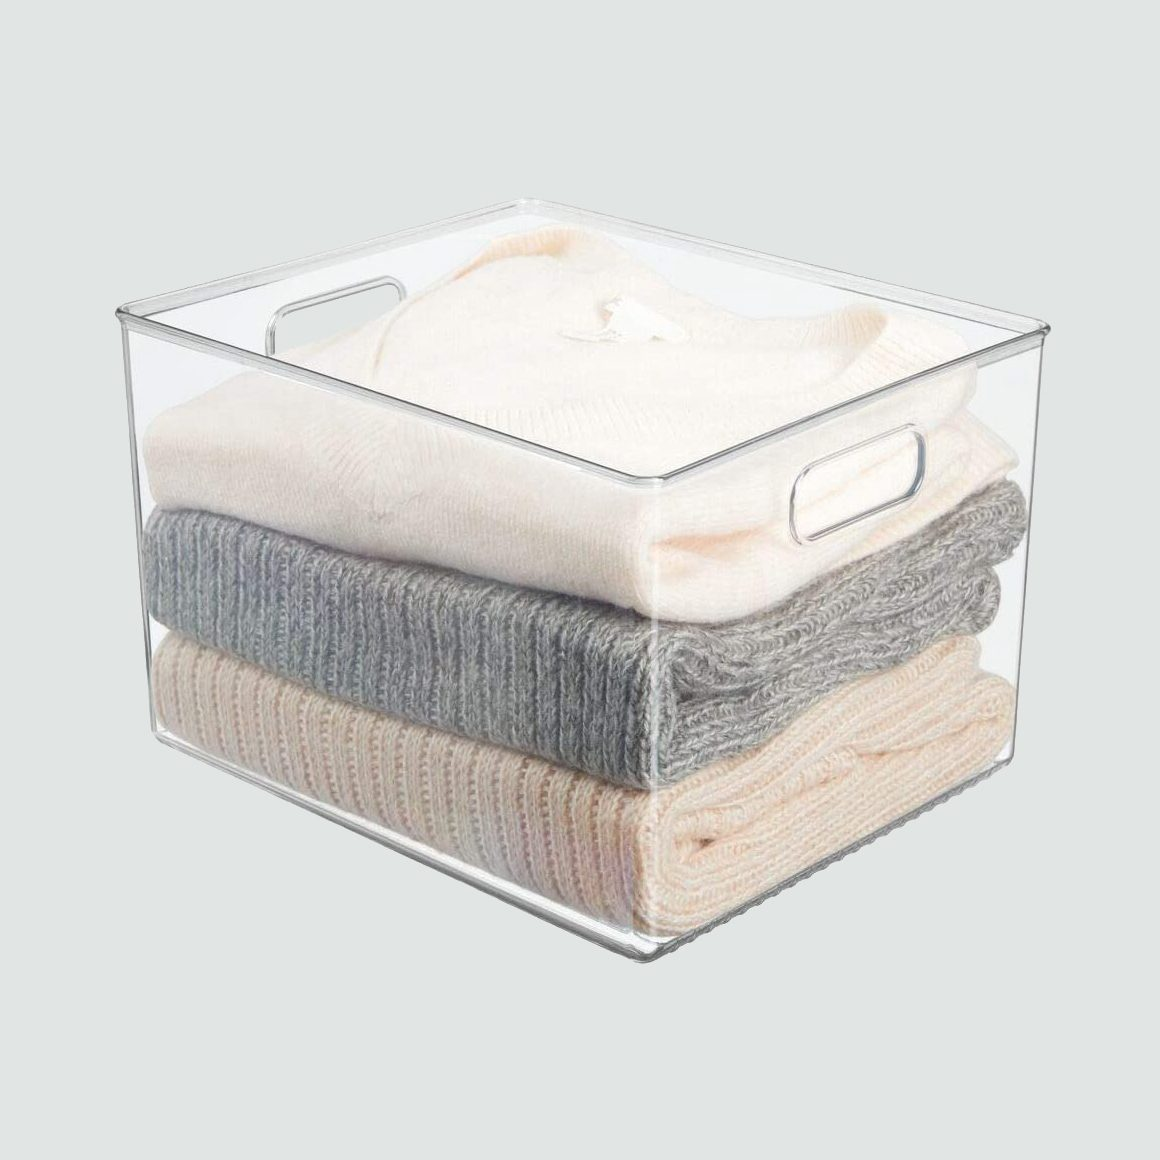 mDesign Plastic Home Storage Basket Bin, 4 pack